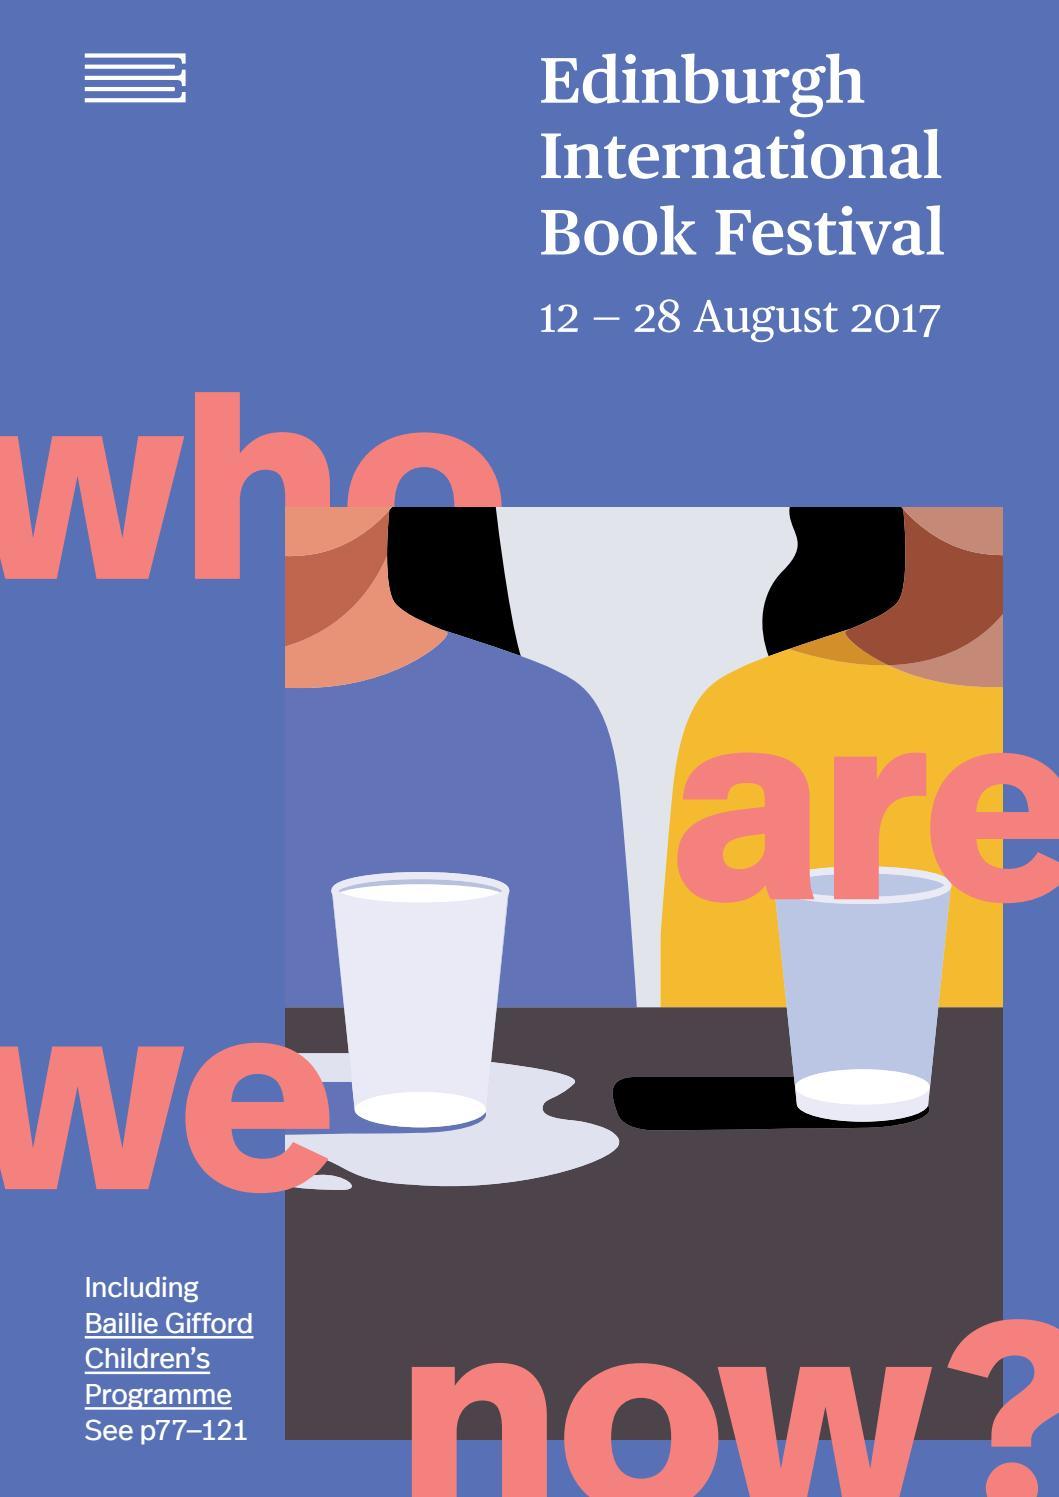 2017 Edinburgh International Book Festival Brochure By 3d Origami Peacock Diagram Stick Tail D Album Jimena Issuu